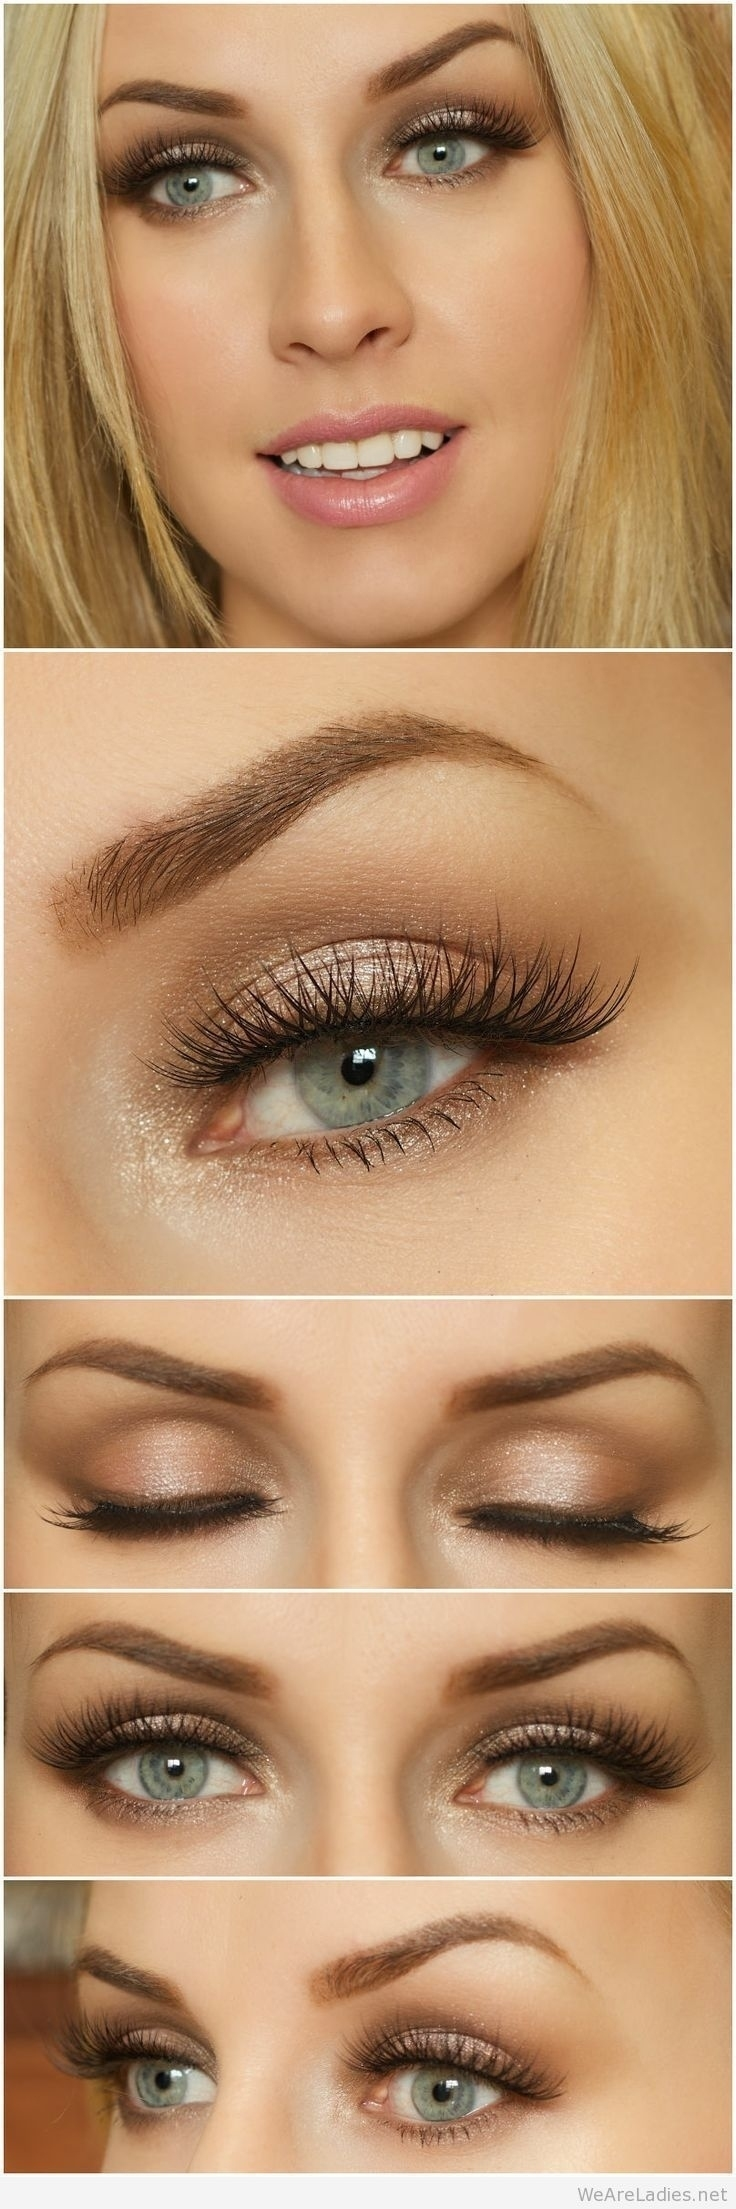 best colour eyeshadow green eyes blonde hair - wavy haircut